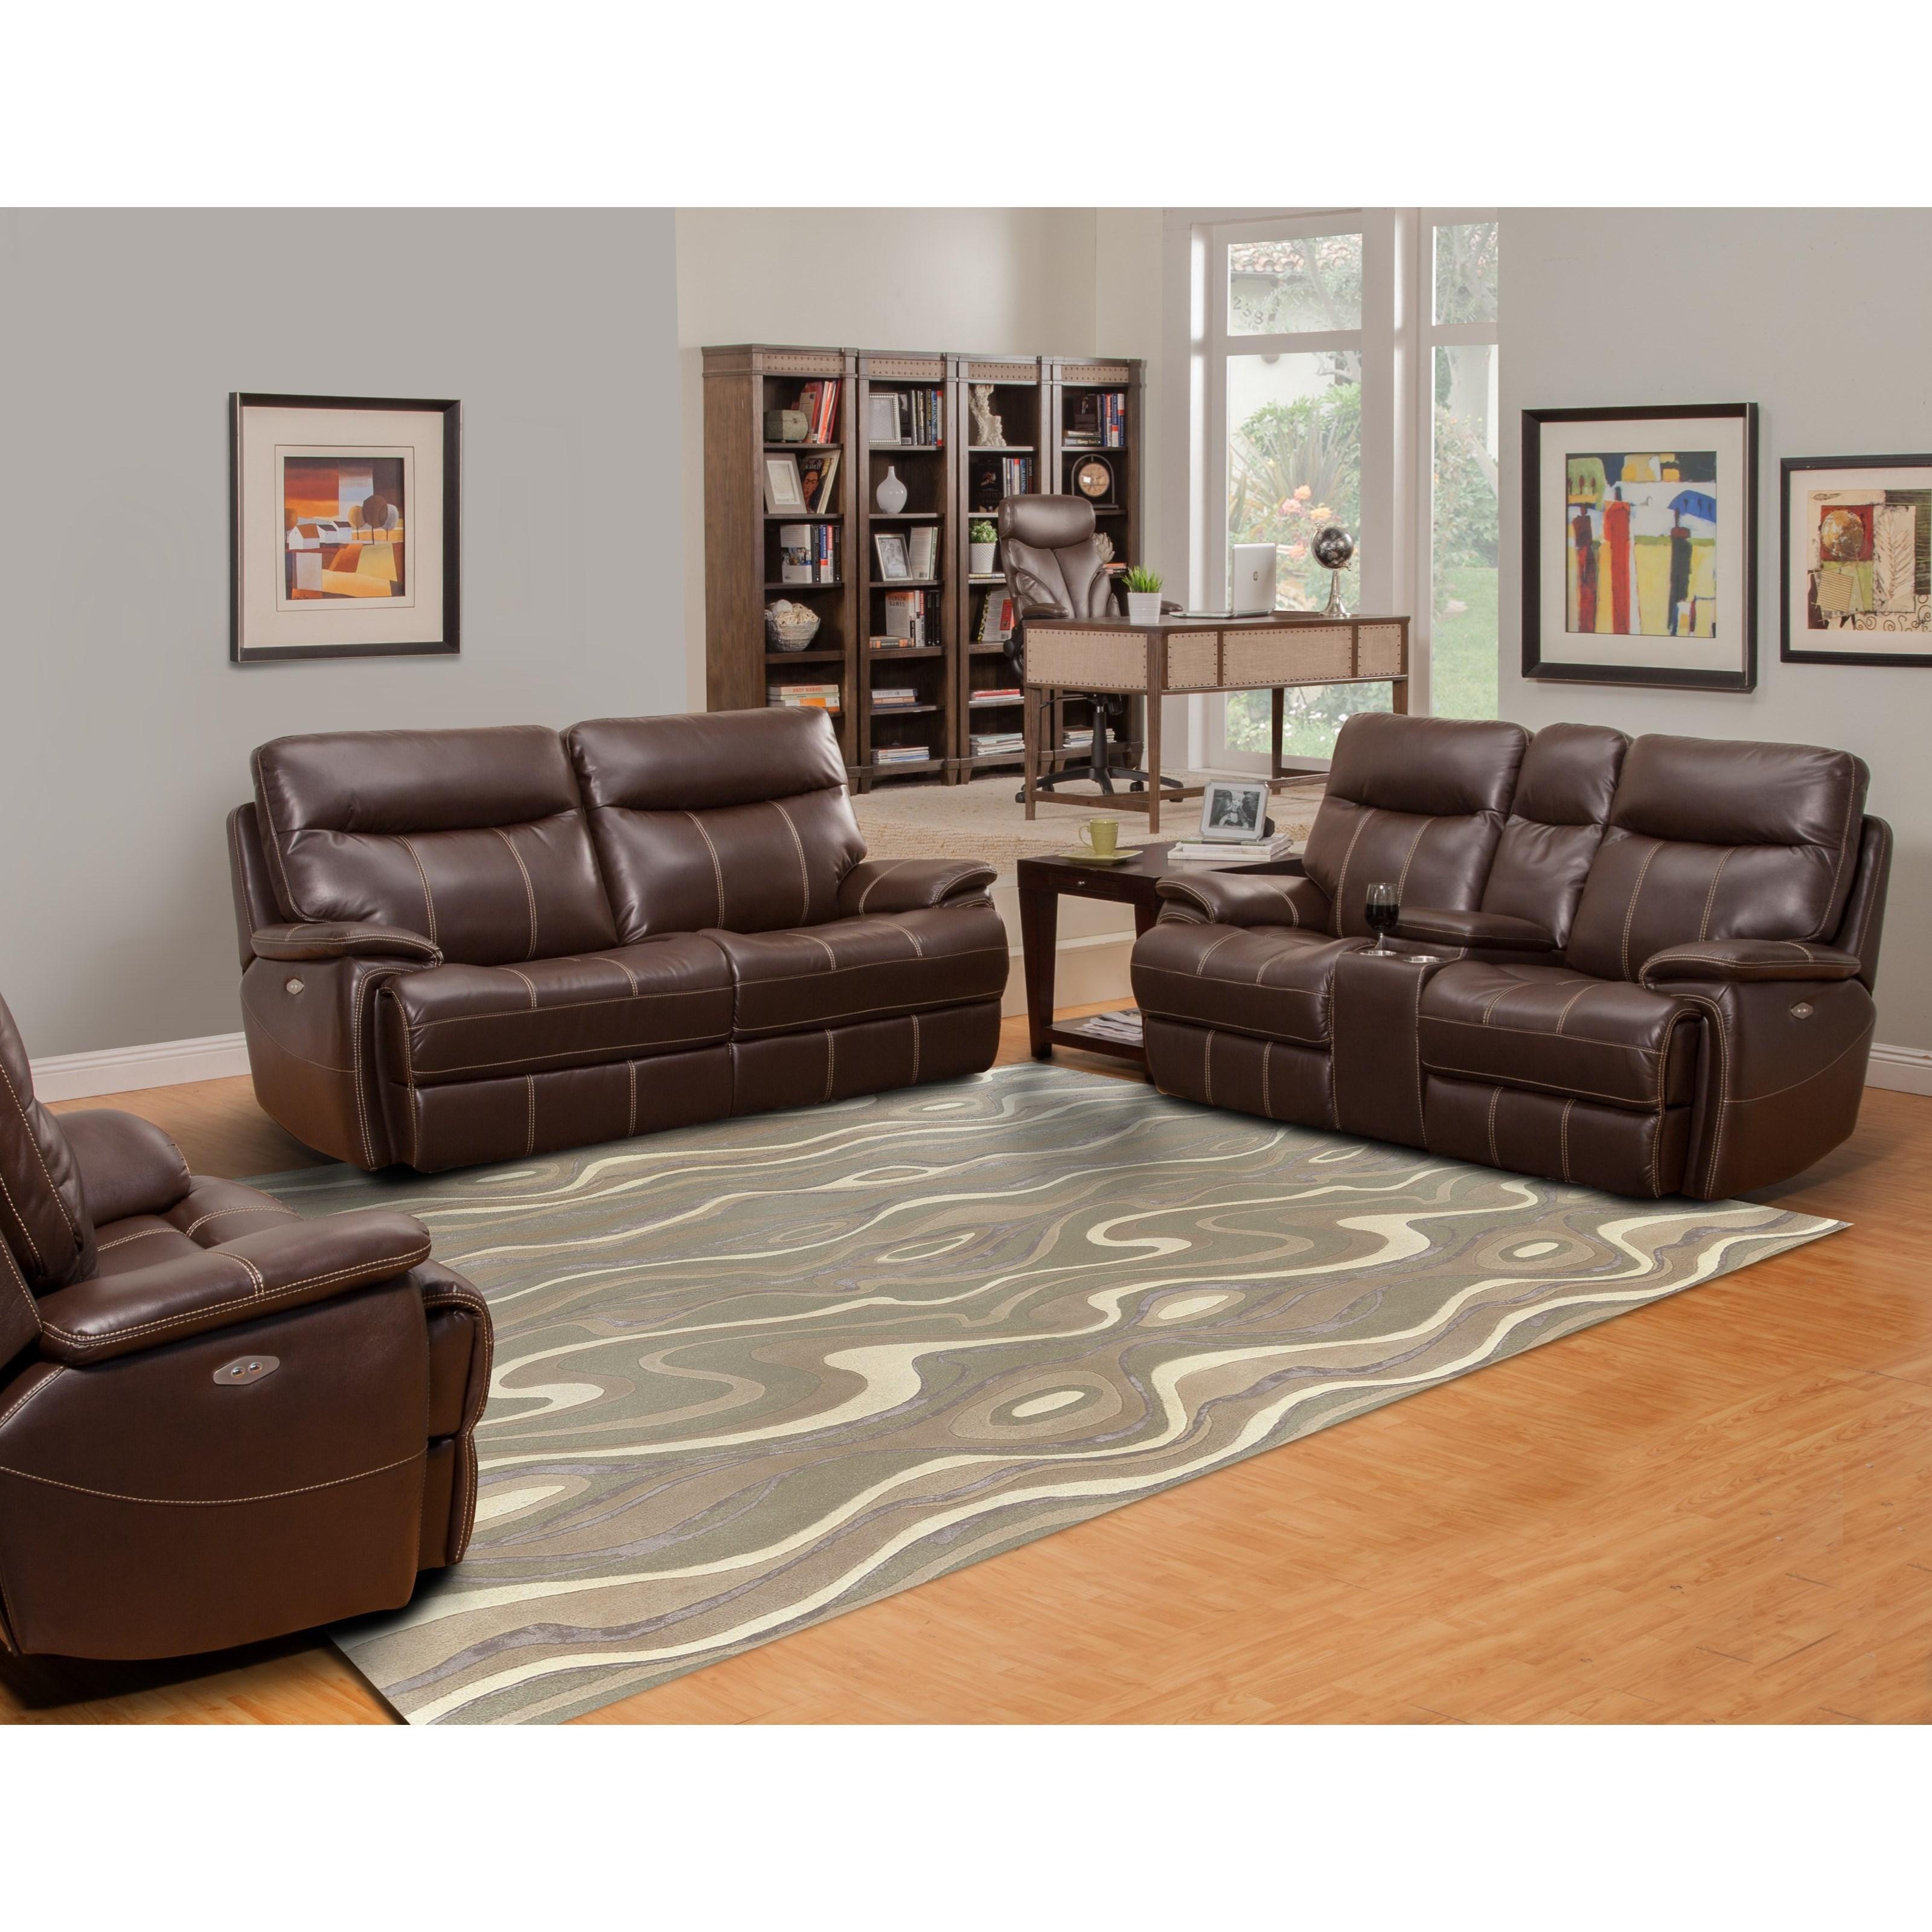 Parker Living Dylan Power Reclining Living Room Group   Item Number: MDYL  Reclining Living Room